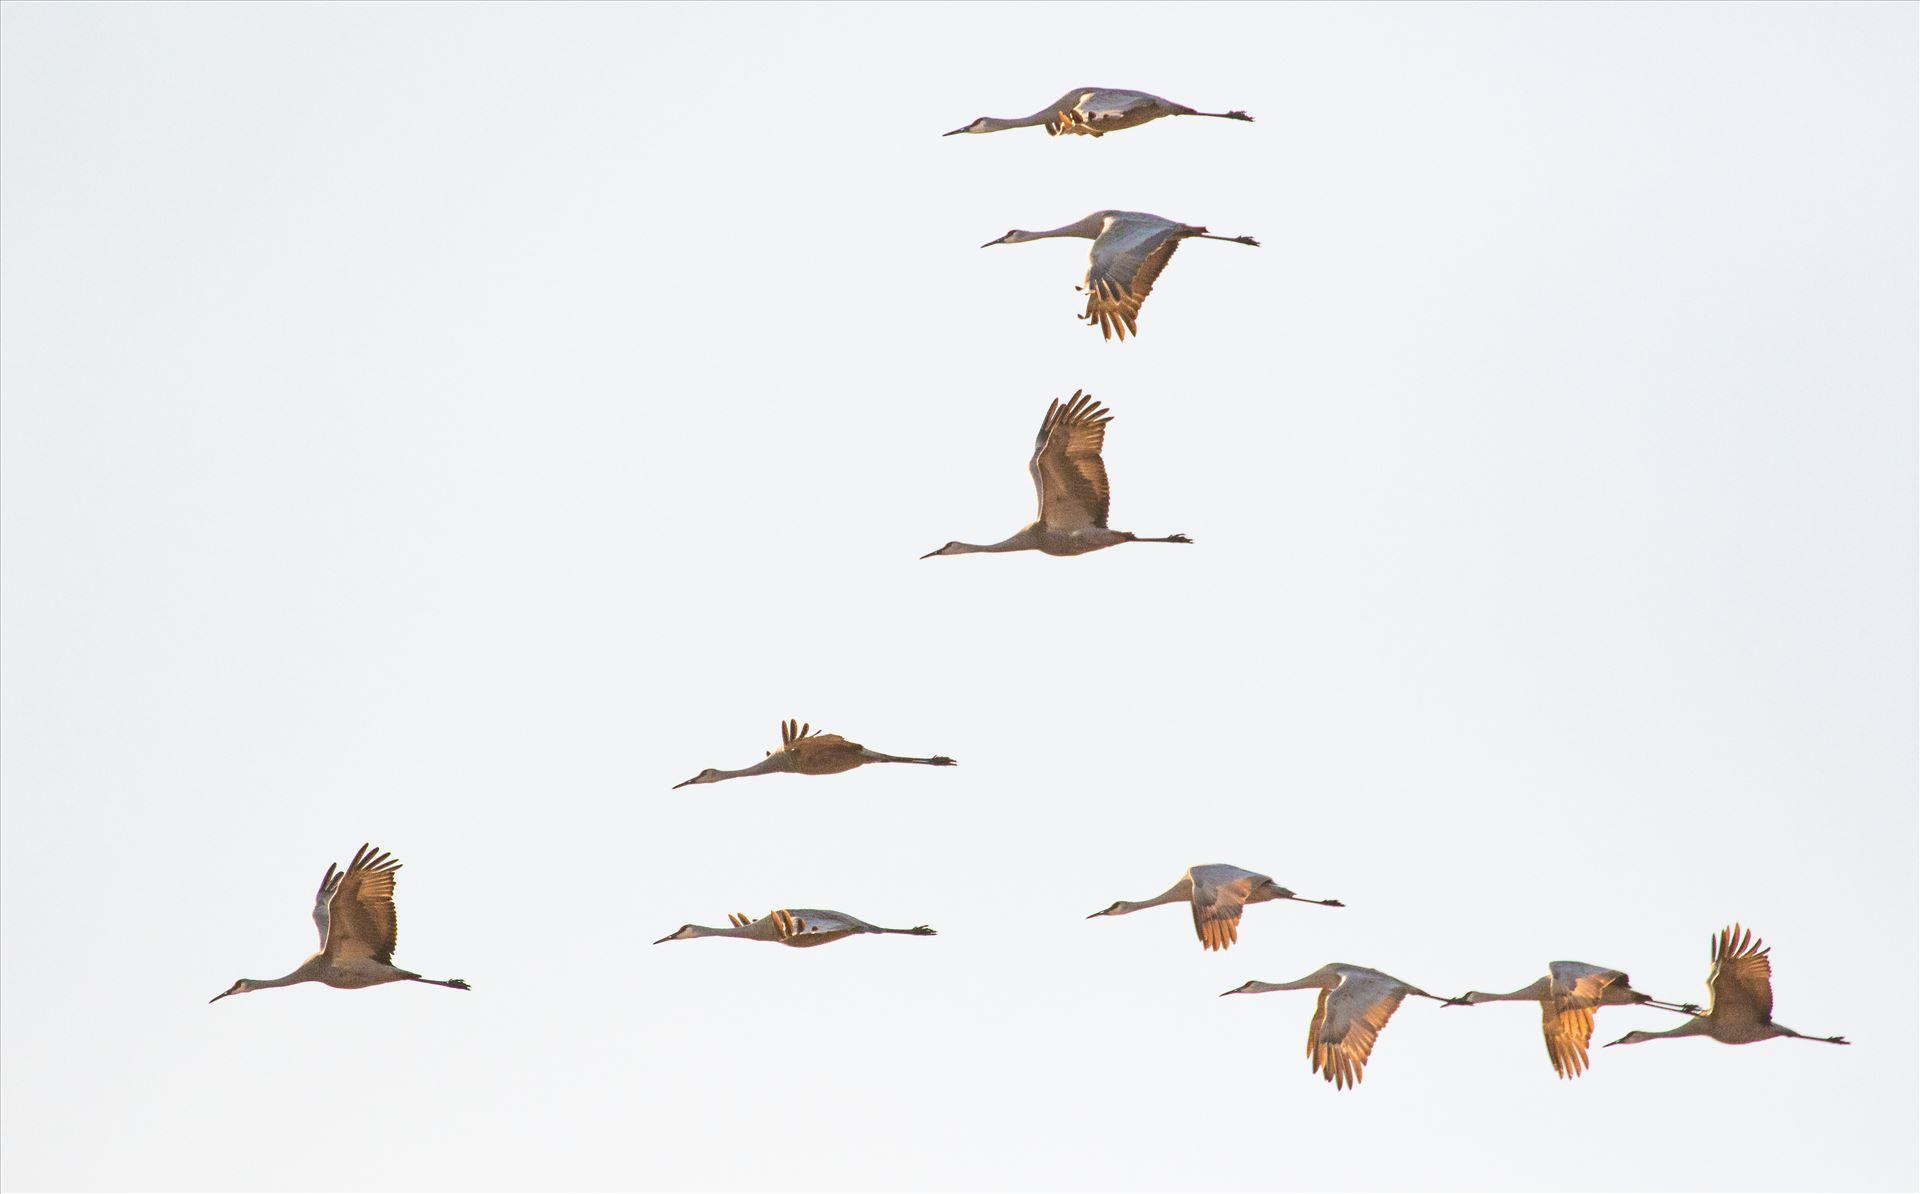 6K9A6461.jpg by Dan Ferrin Photography-Sandhill Cranes